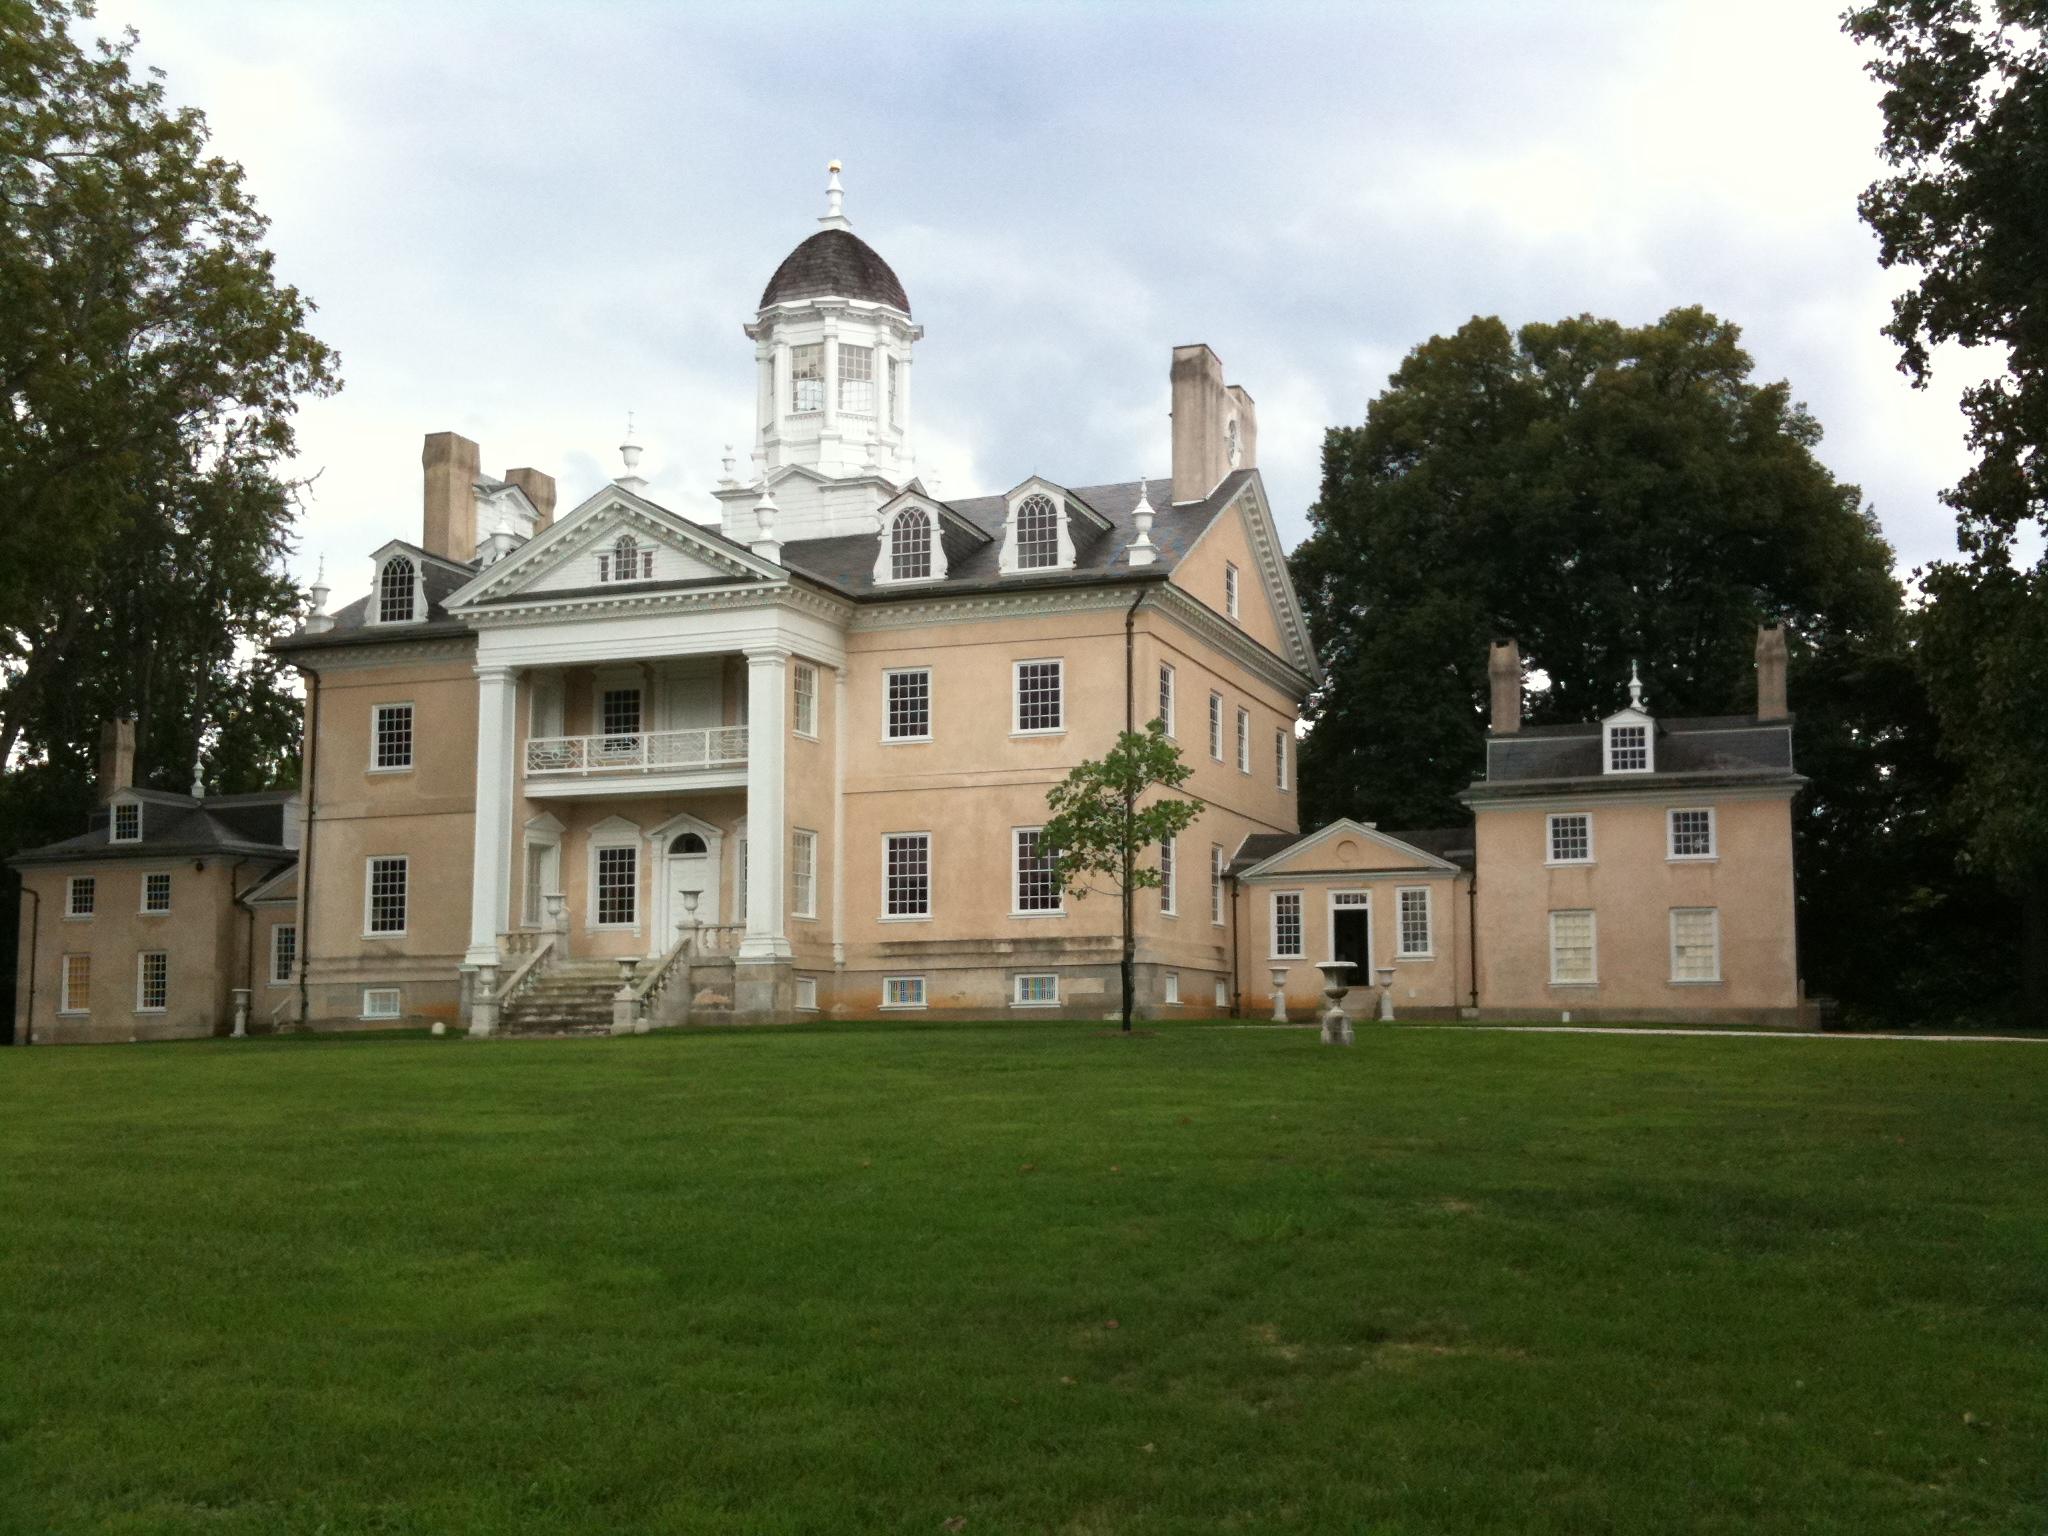 18th century hampton mansion